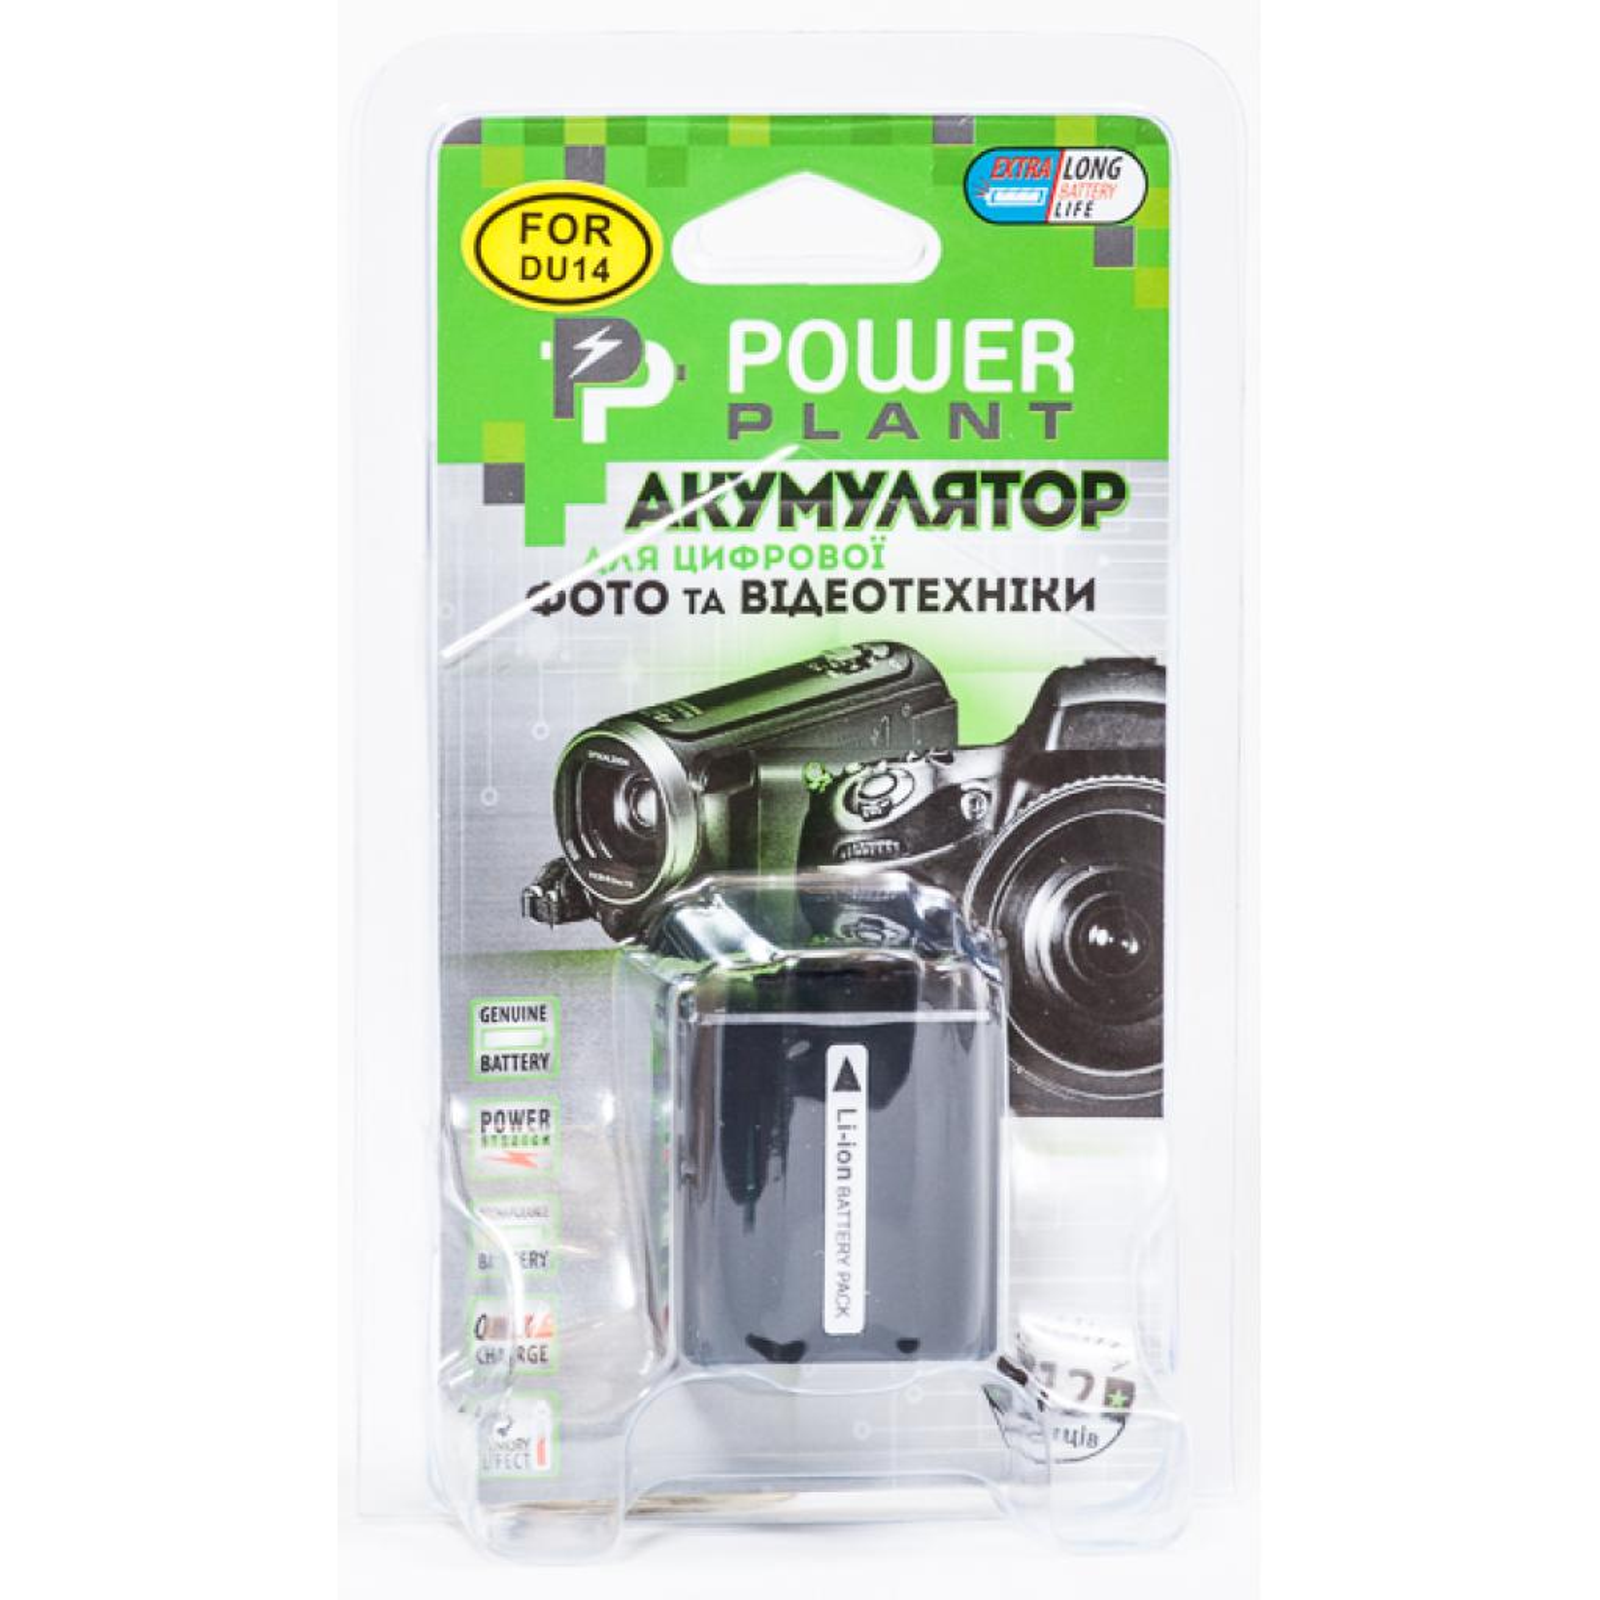 Аккумулятор к фото/видео Panasonic CGA-DU14 PowerPlant (DV00DV1182) изображение 3